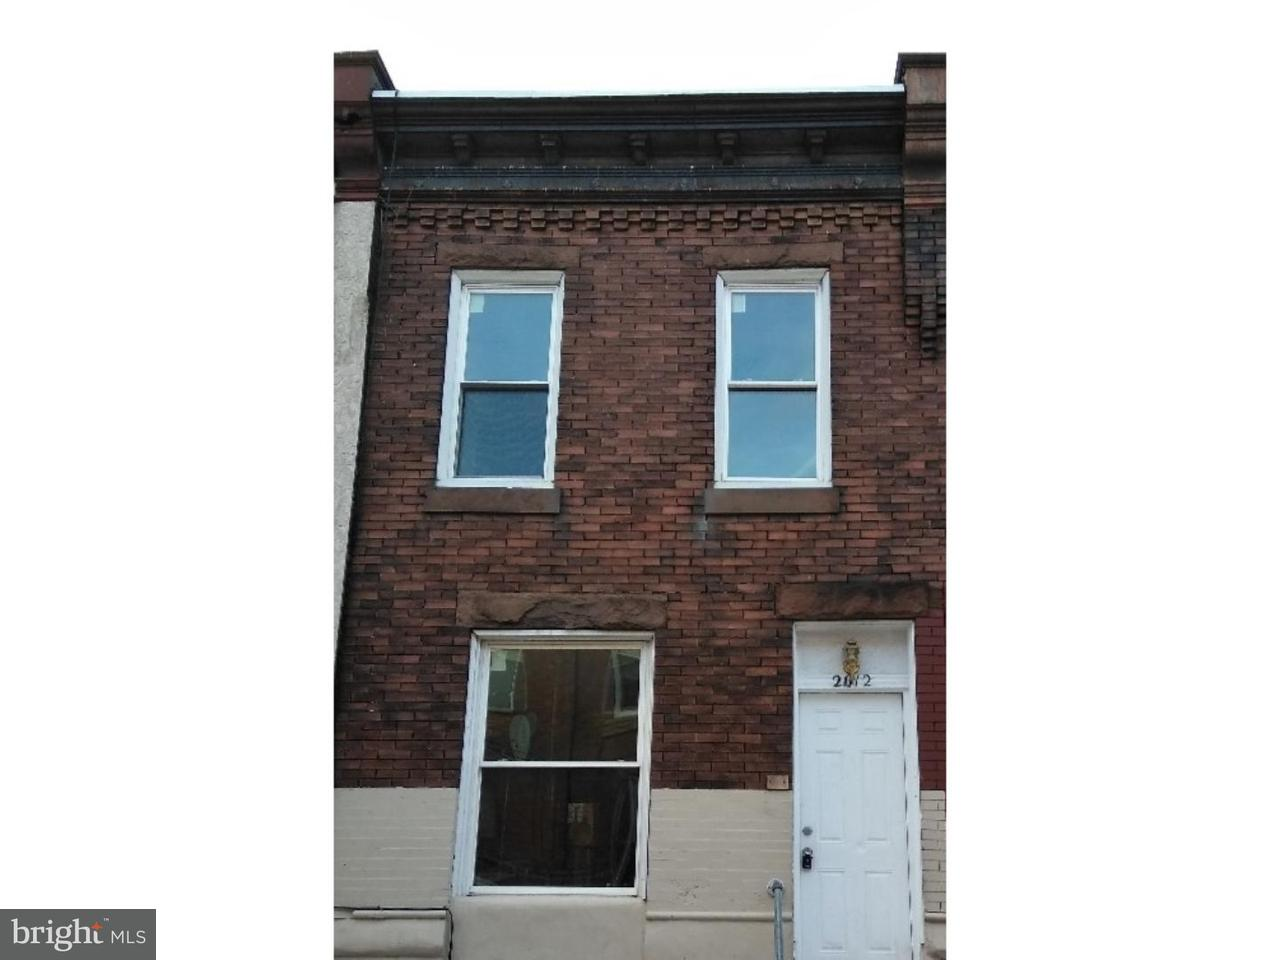 2012 S Norwood Philadelphia, PA 19145